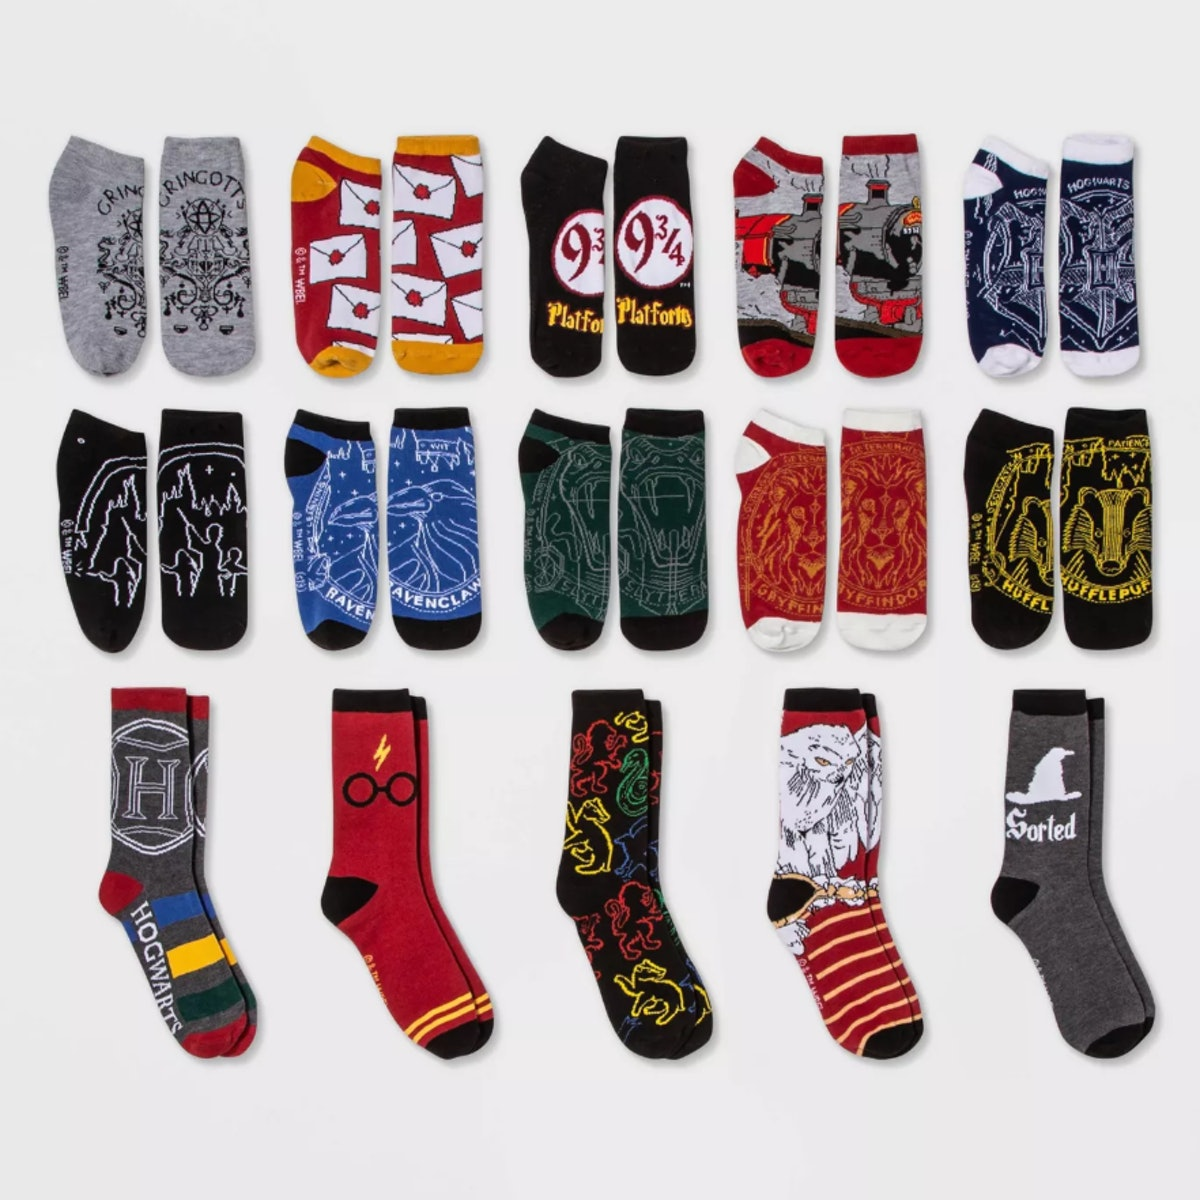 Harry Potter Owl 15 Days of Socks Advent Calendar